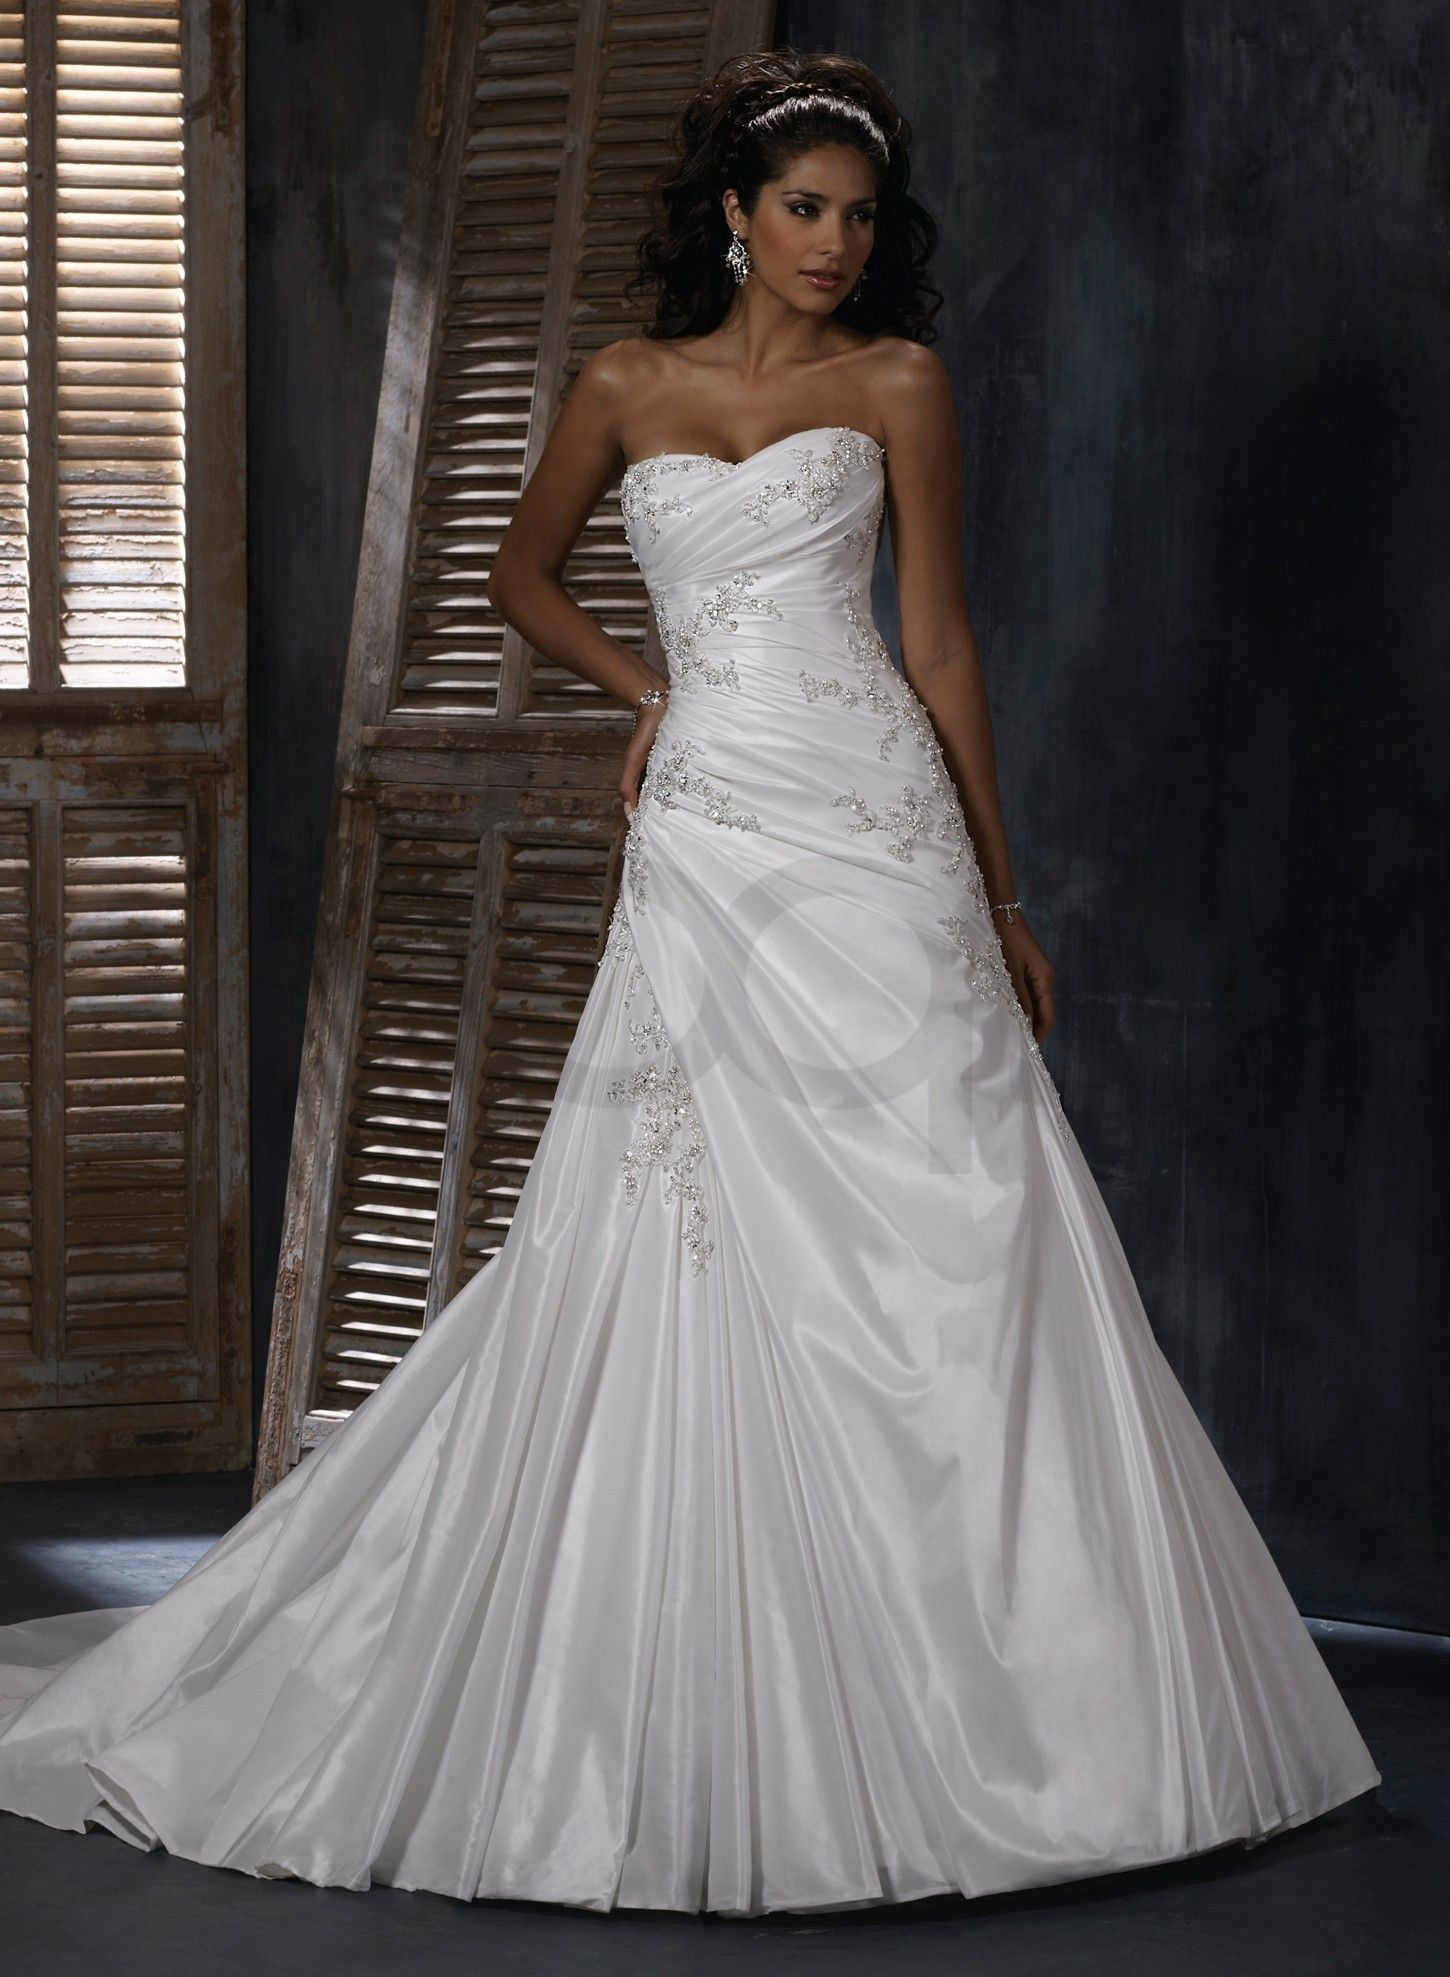 Sweet Heart Wedding Dresses Bordeaux Taffeta Soft Sweetheart Neckline A Line Dress